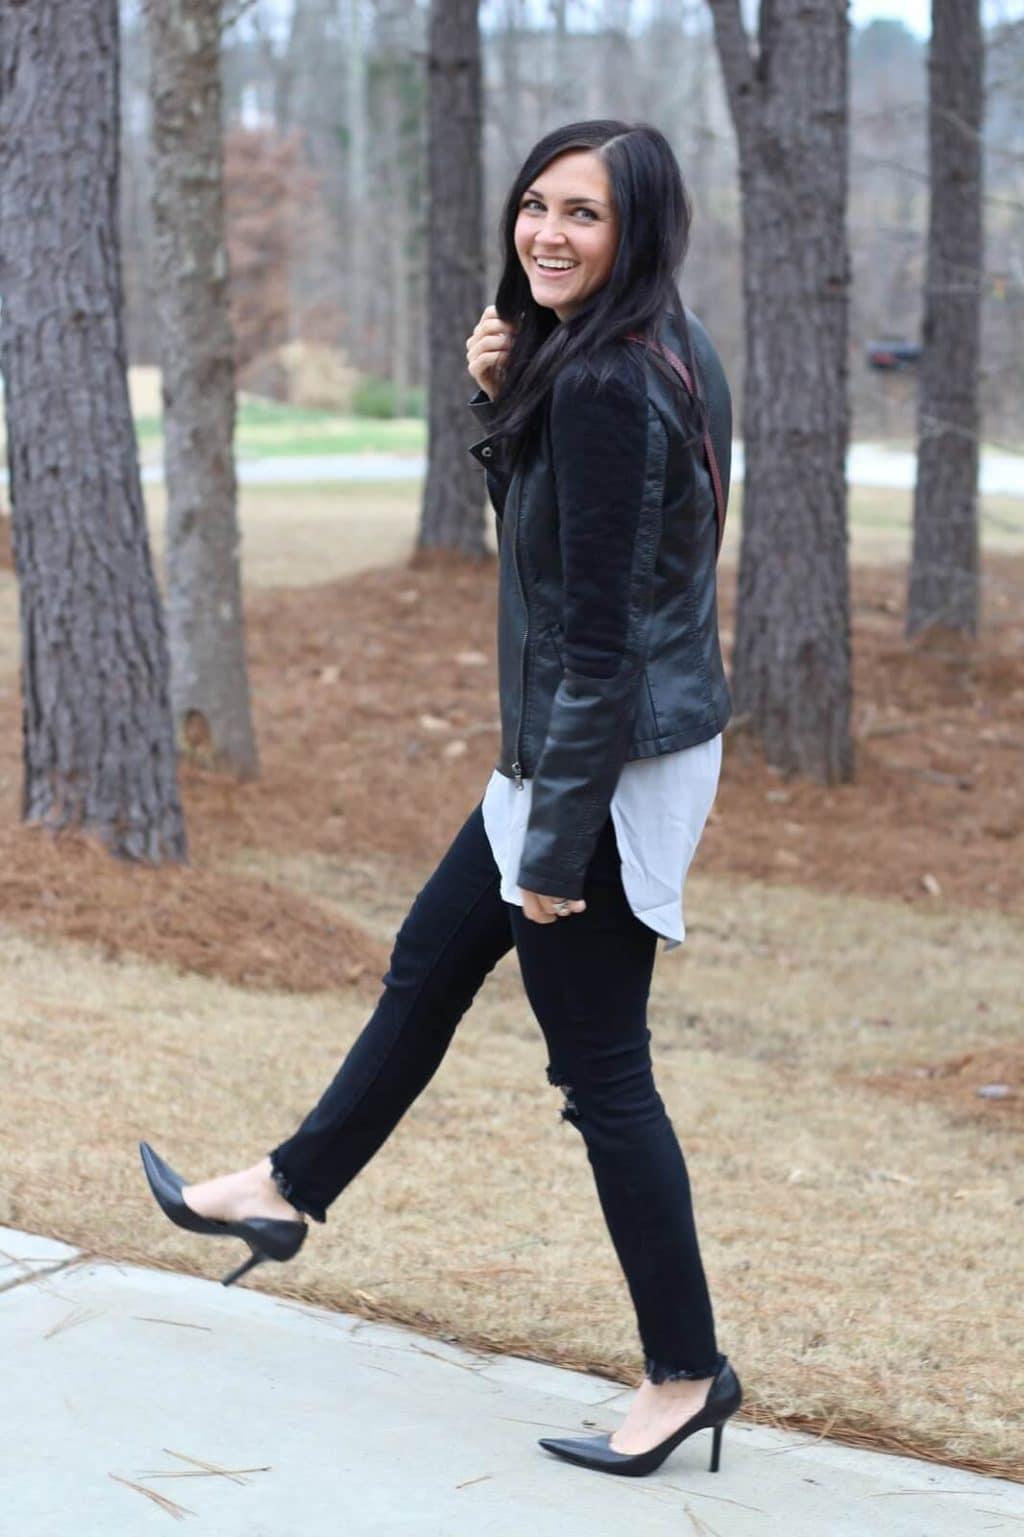 Leather Jacket and Distressed Denim worn with Stilettos